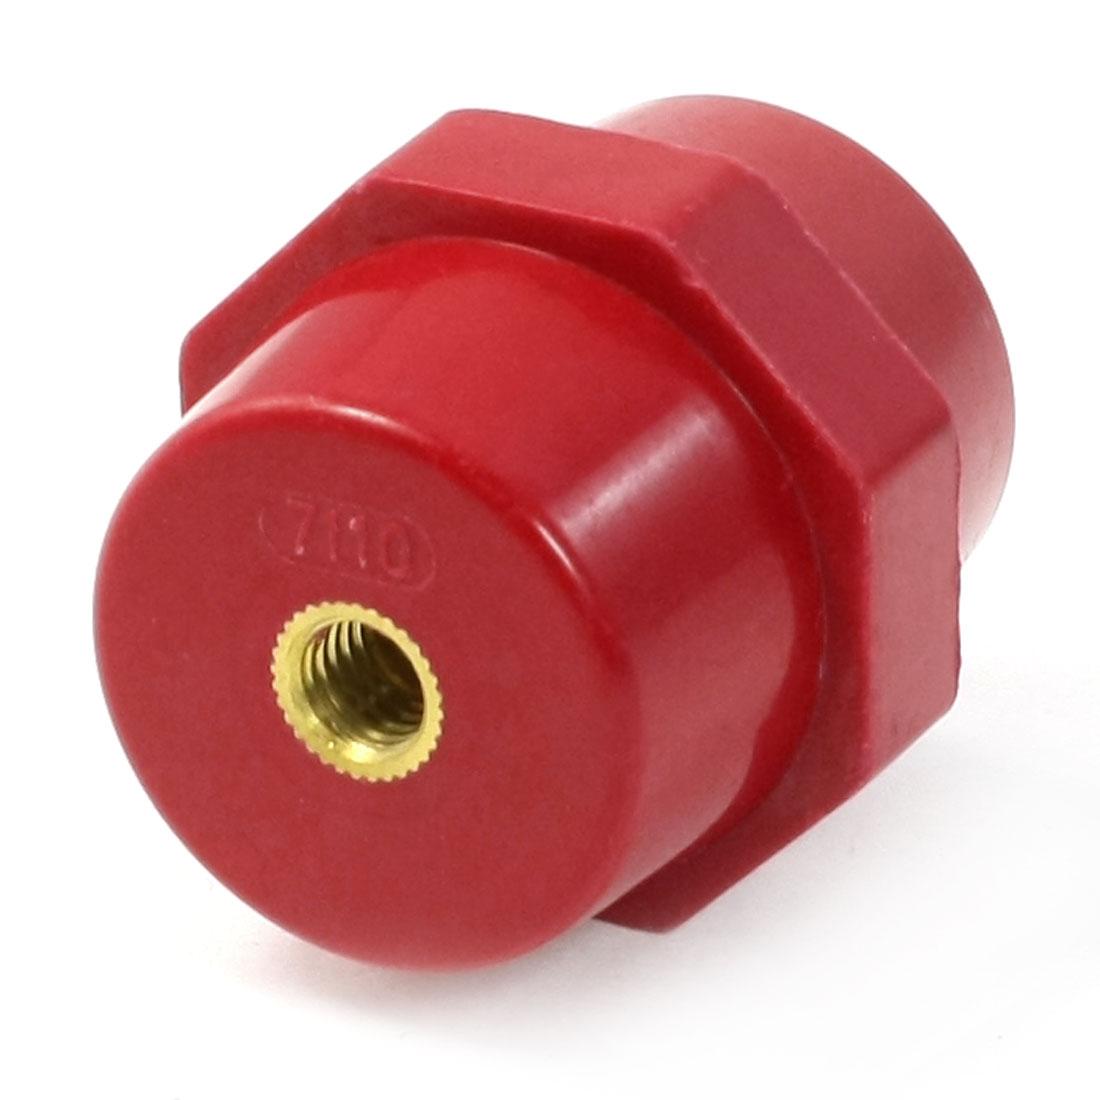 8mm Gold Tone Female Thread Red Enhanced Insulator SM7110 for Bus Bar